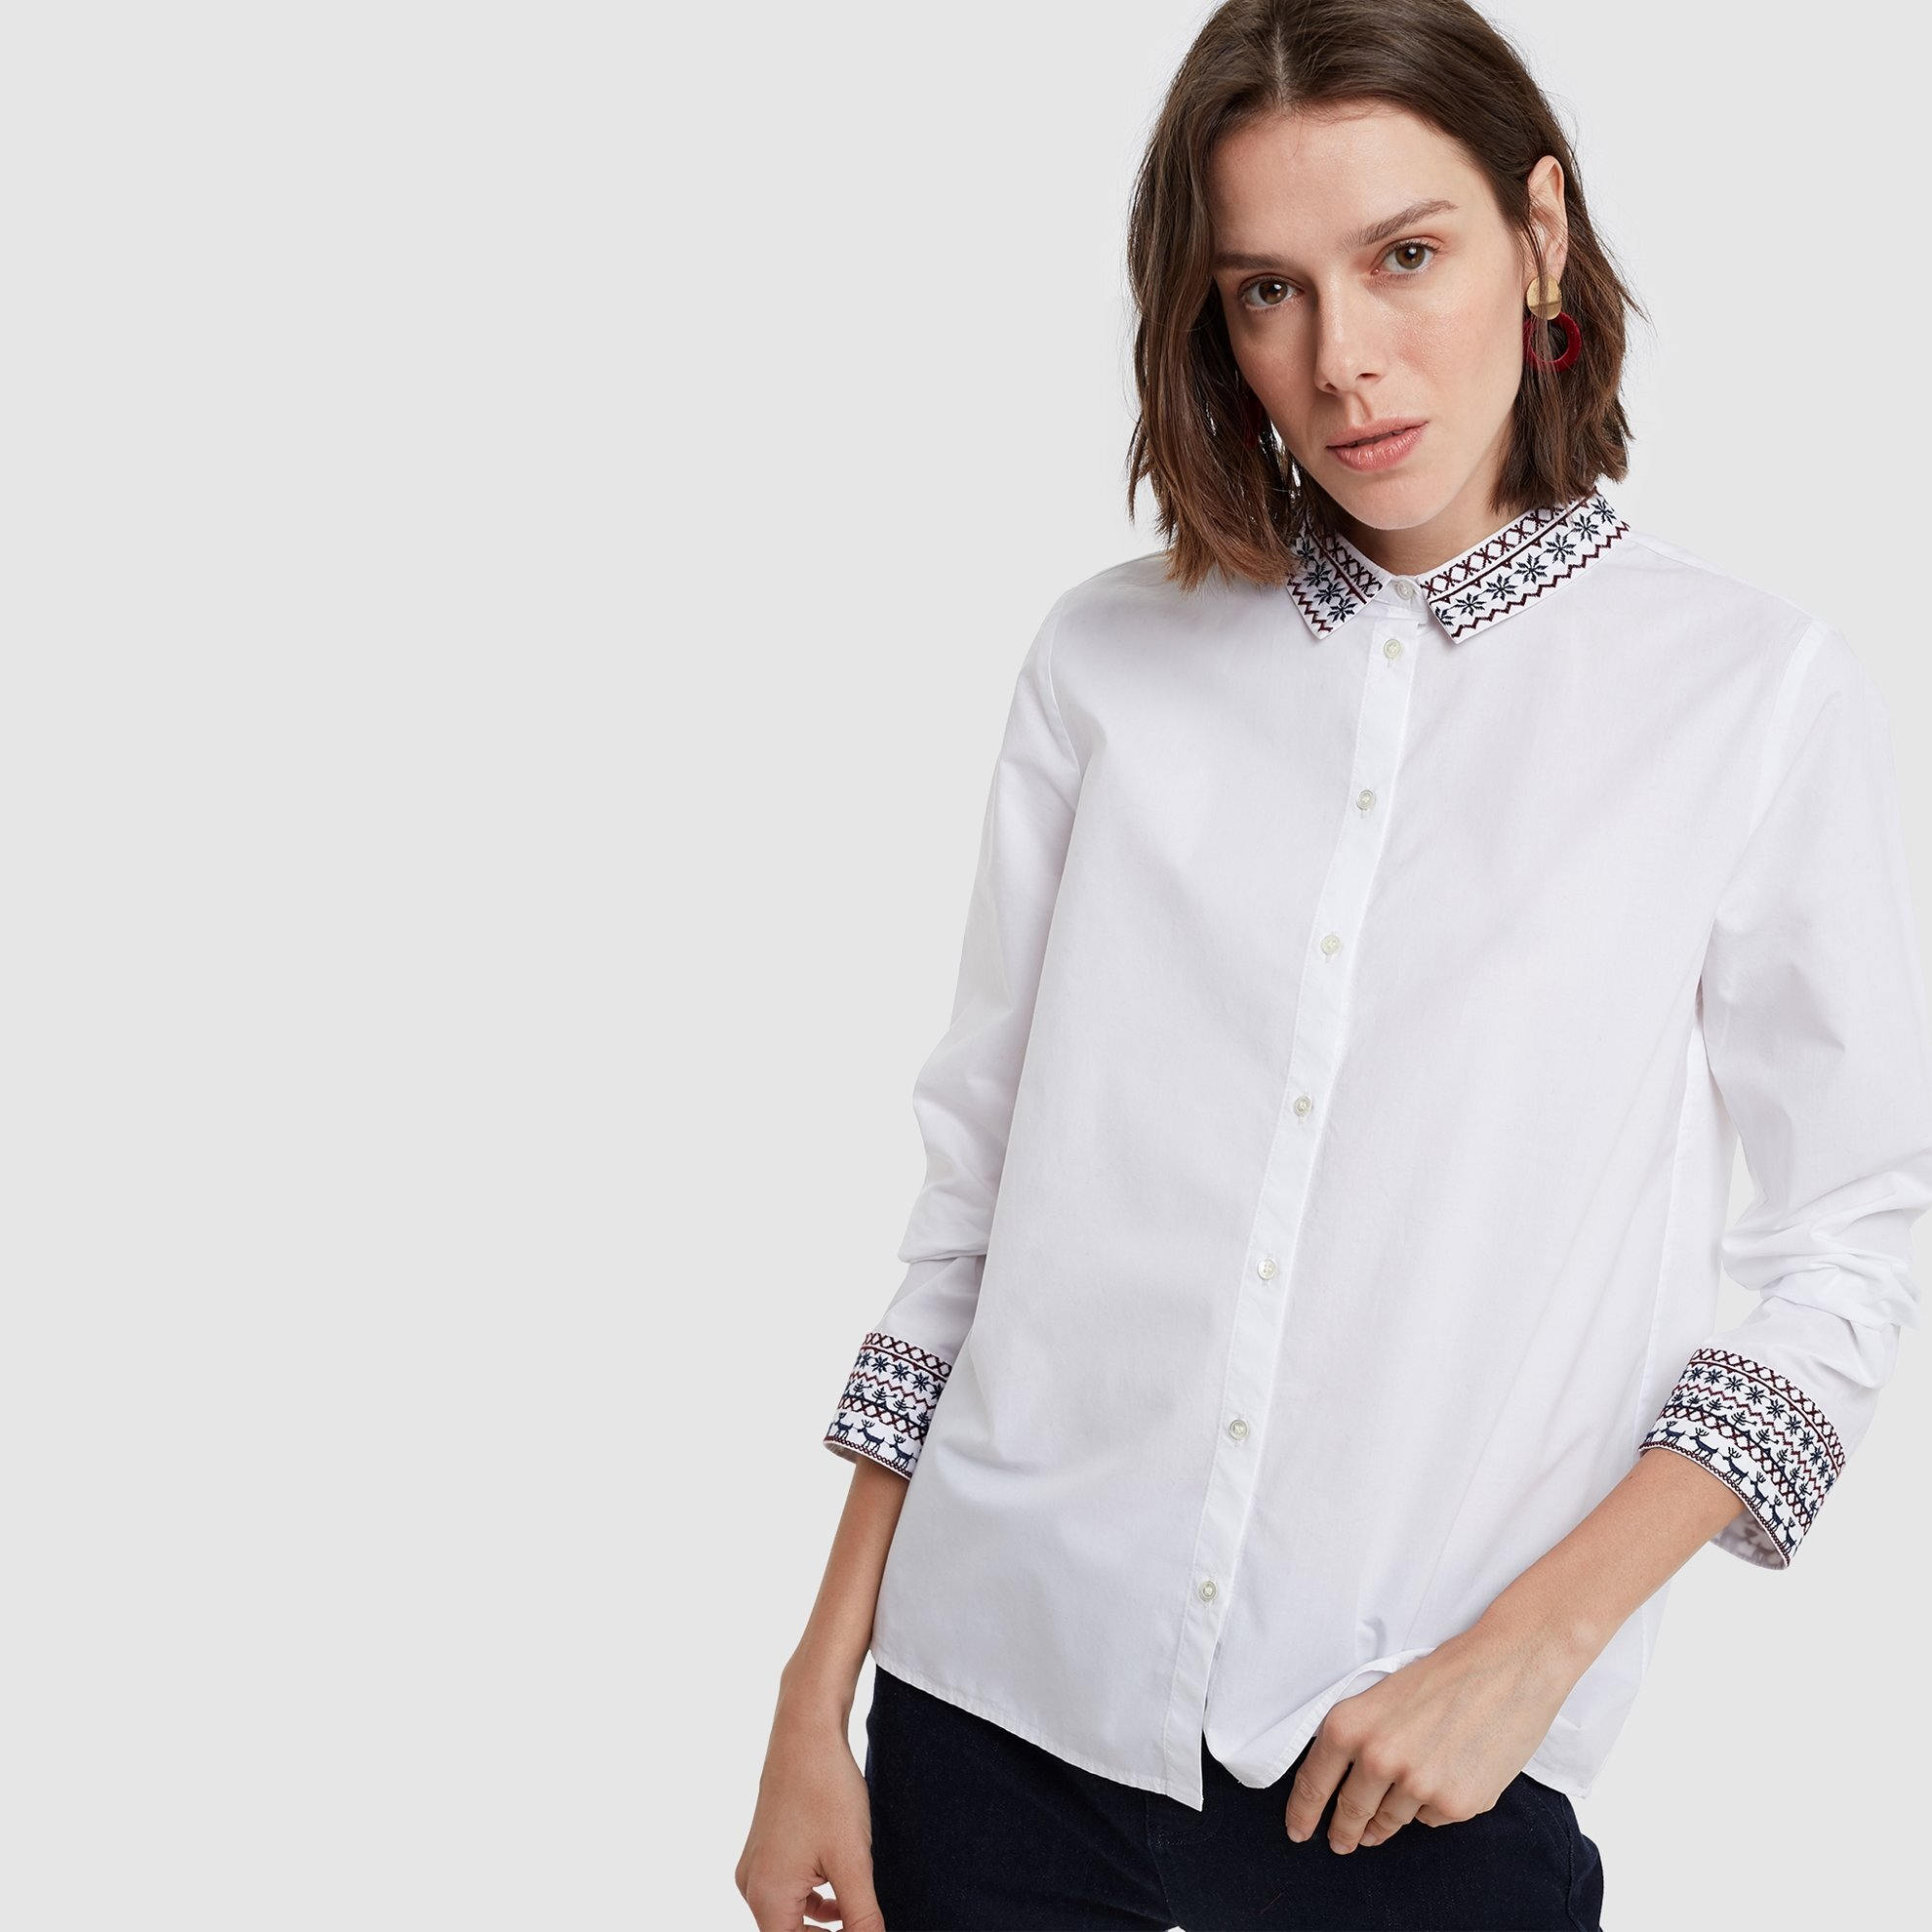 resm Nakış Detaylı Gömlek